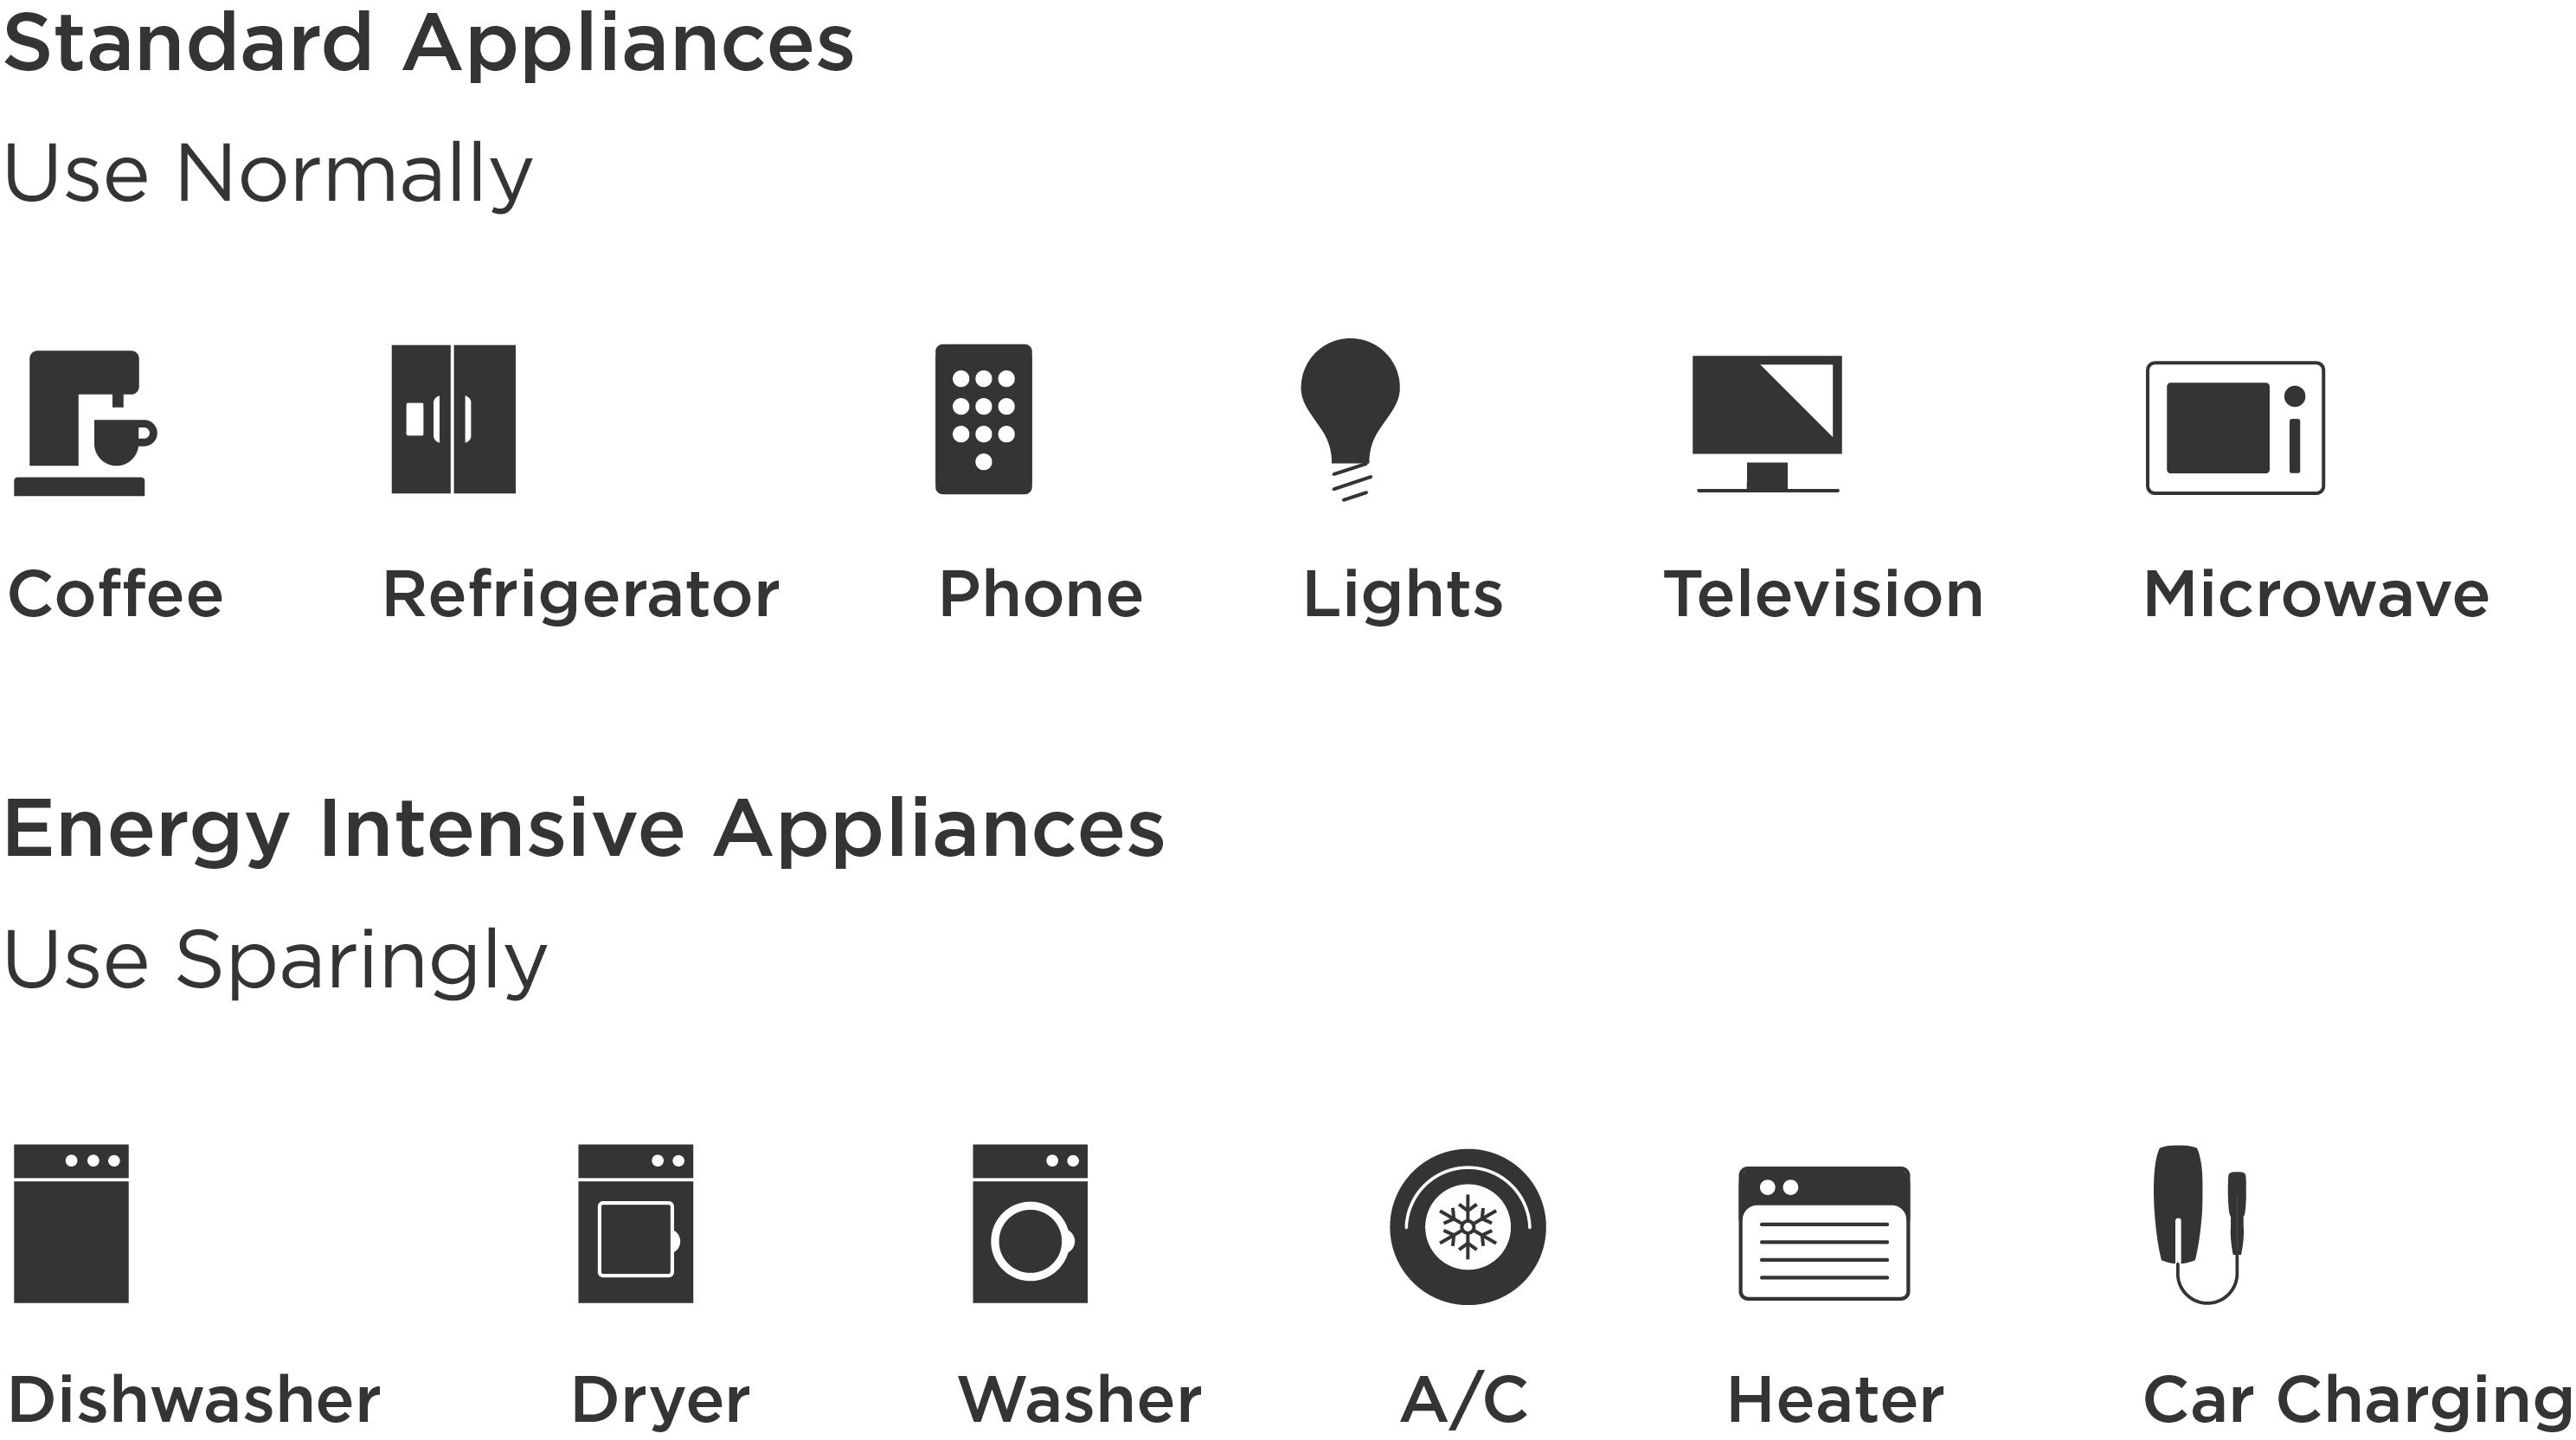 Standard appliances and energy intensive appliances diagram